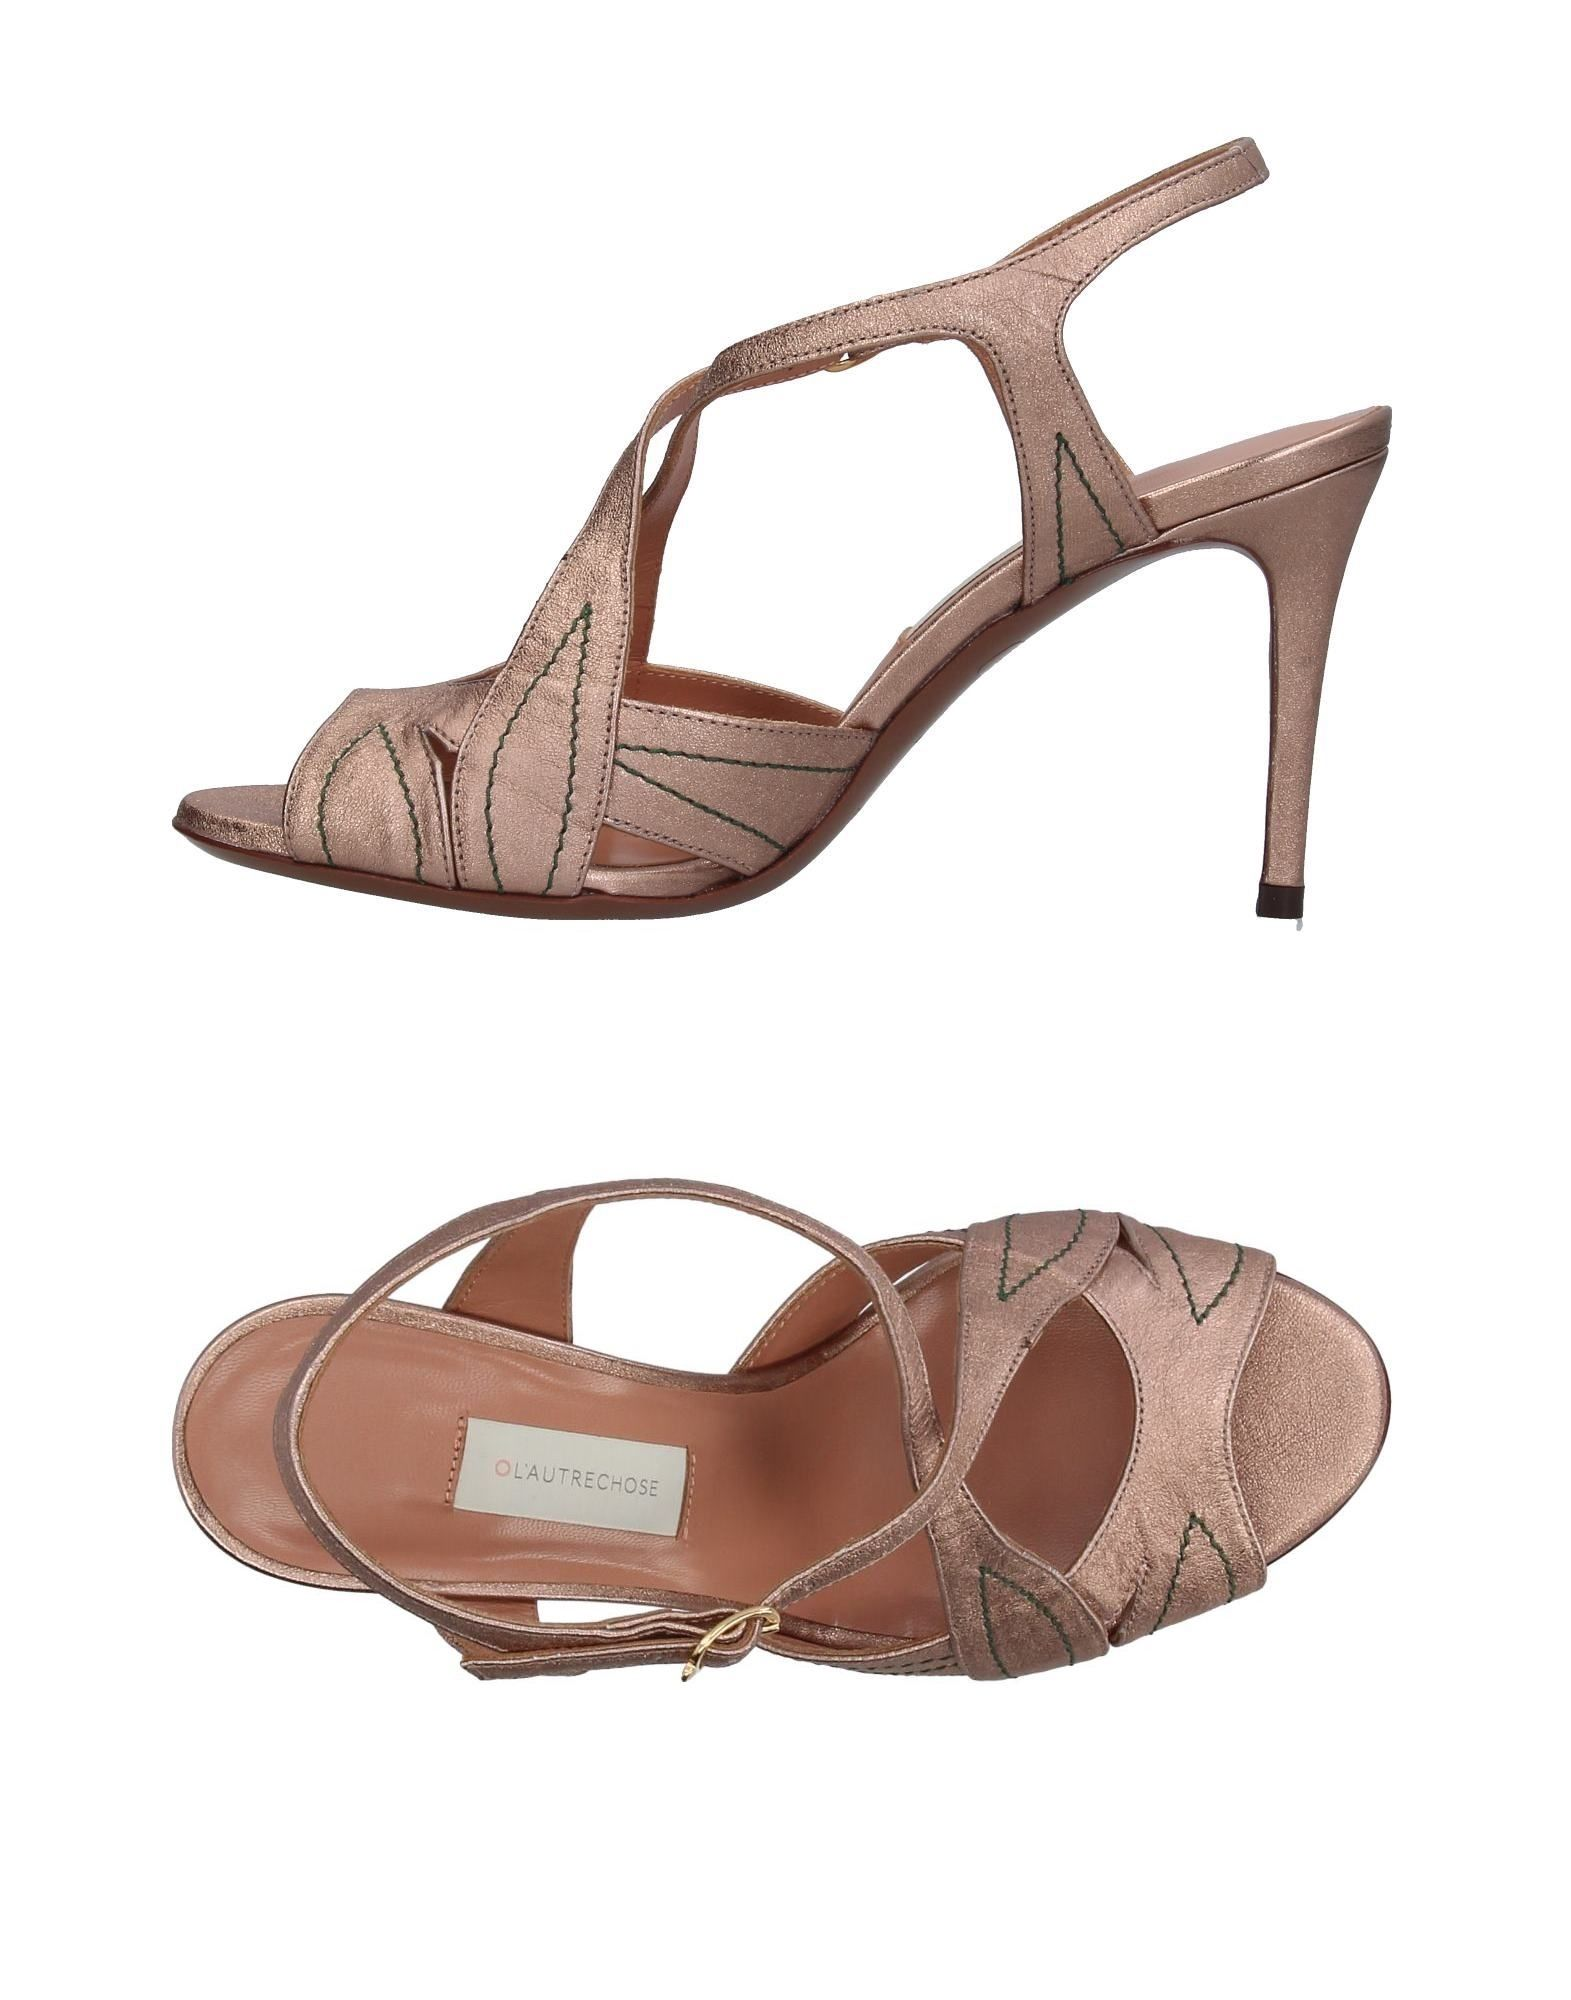 L' Autre Chose Sandalen Damen  11382644HUGut aussehende strapazierfähige Schuhe